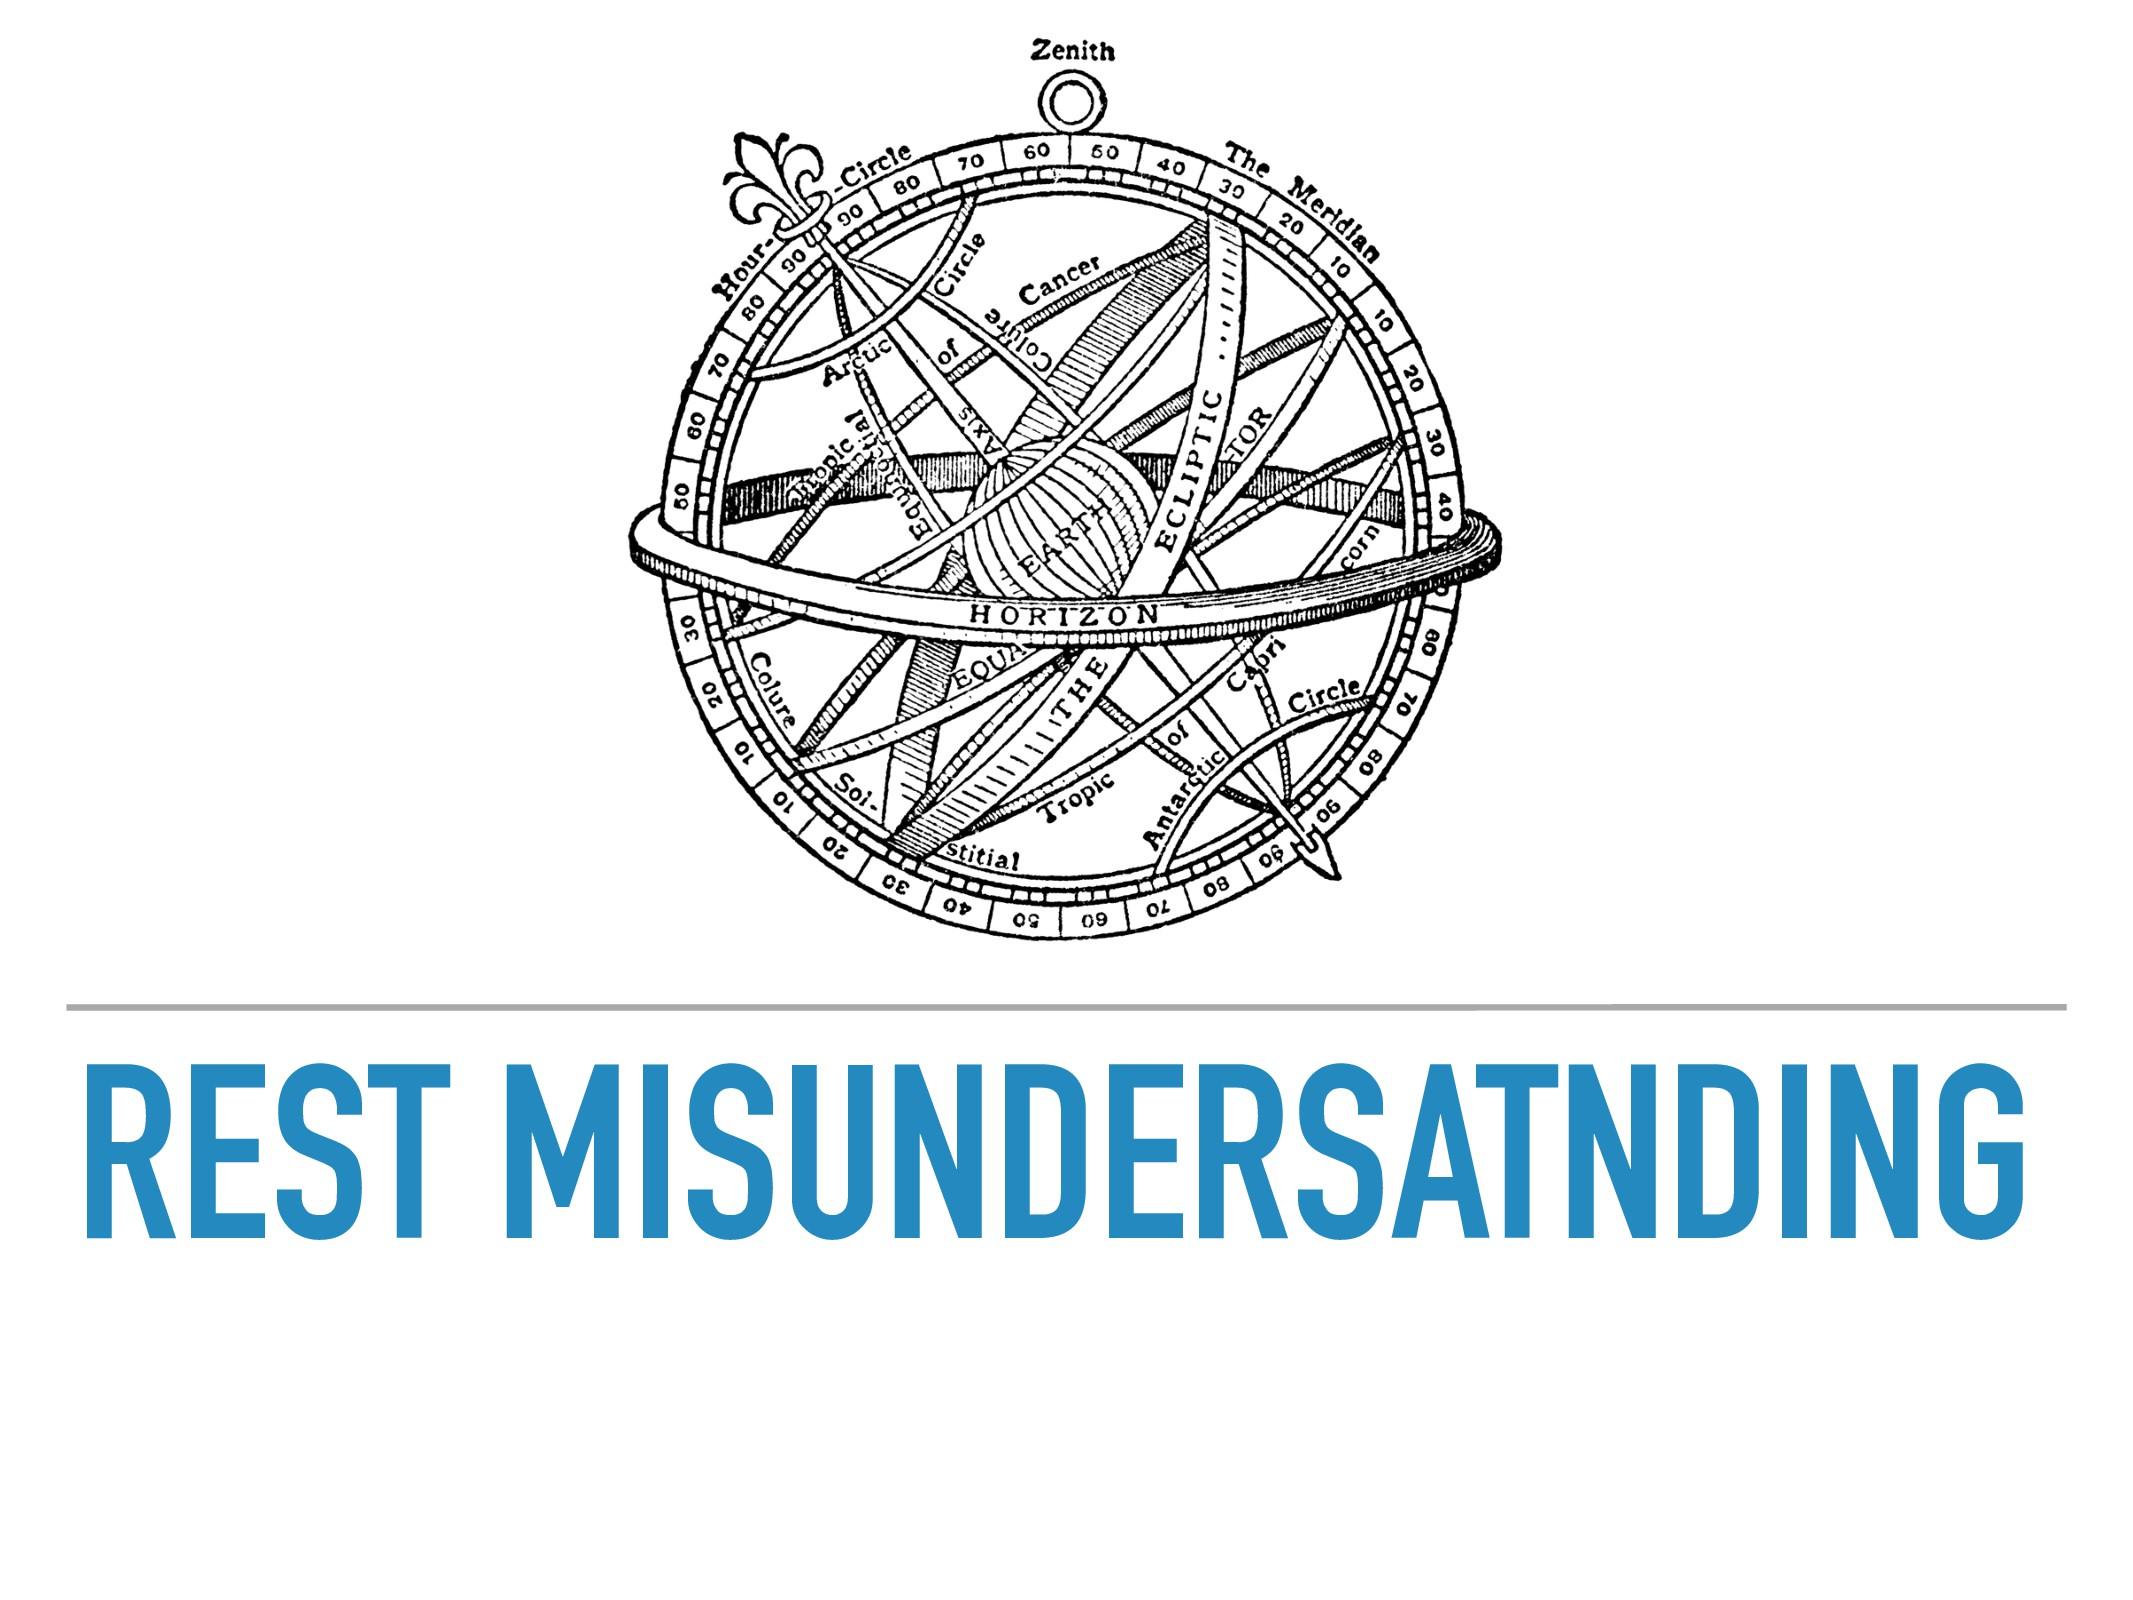 REST MISUNDERSATNDING